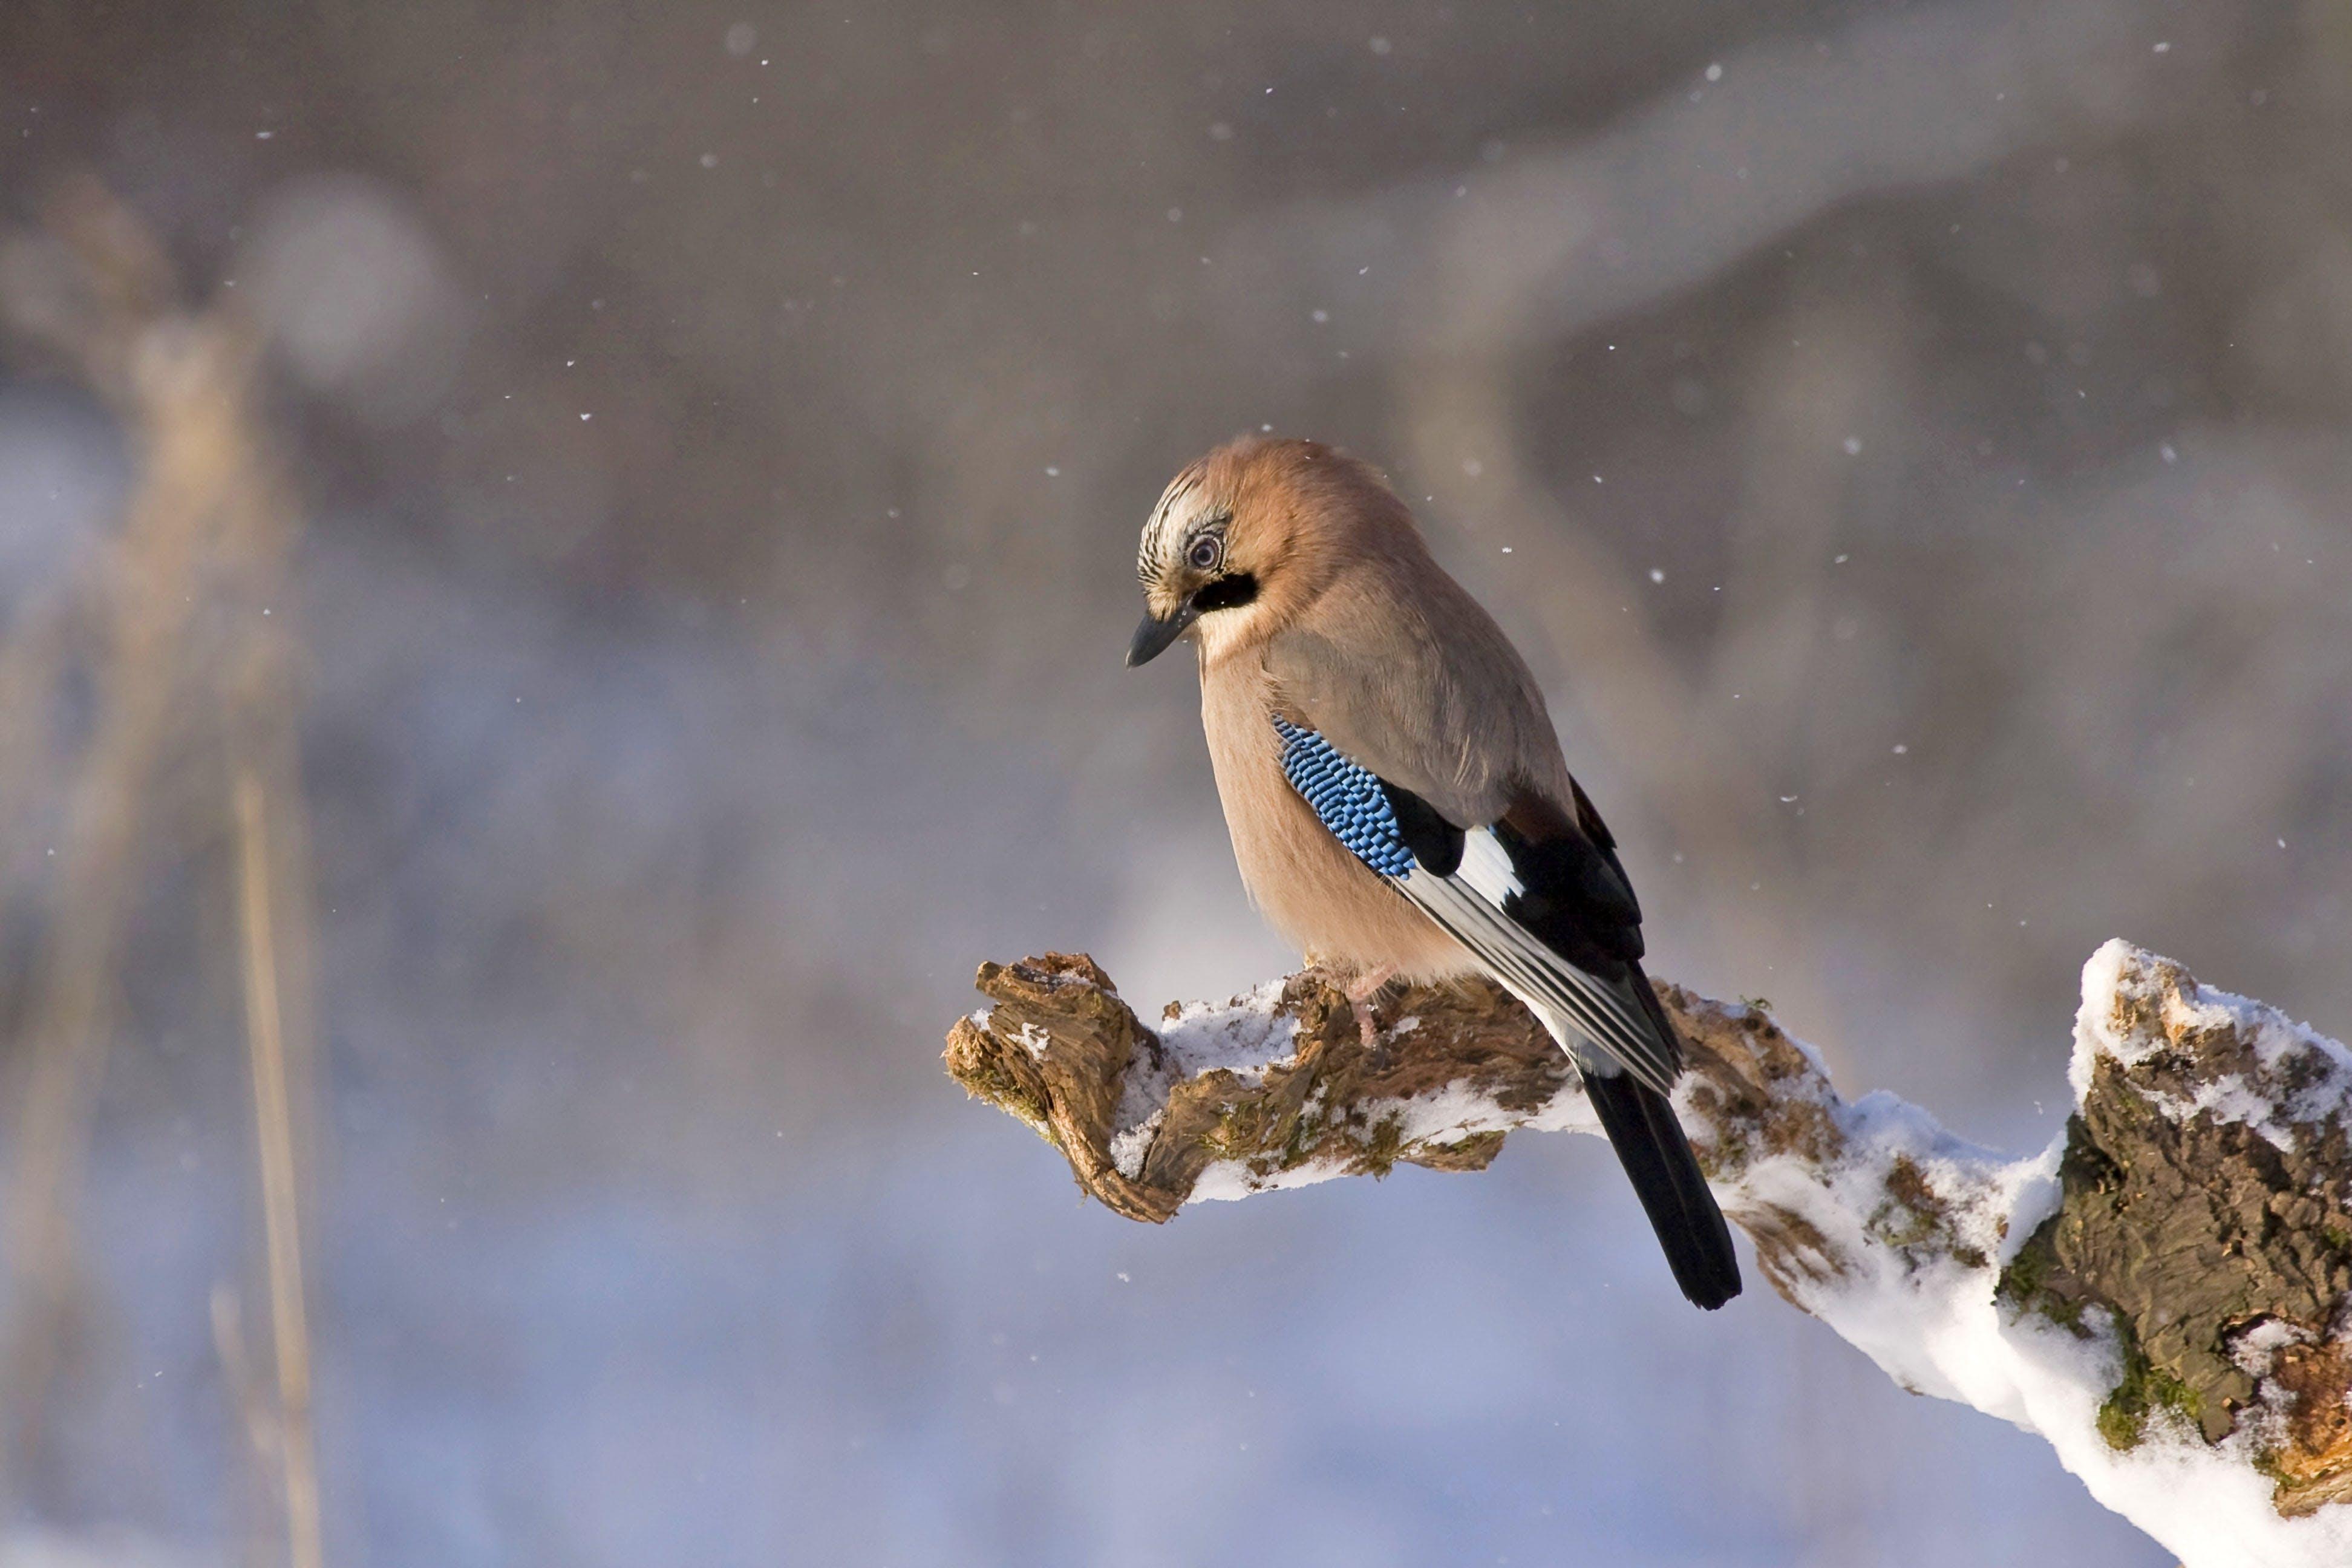 Brown Black and Blue Bird Sitting on Brown Tree Twig